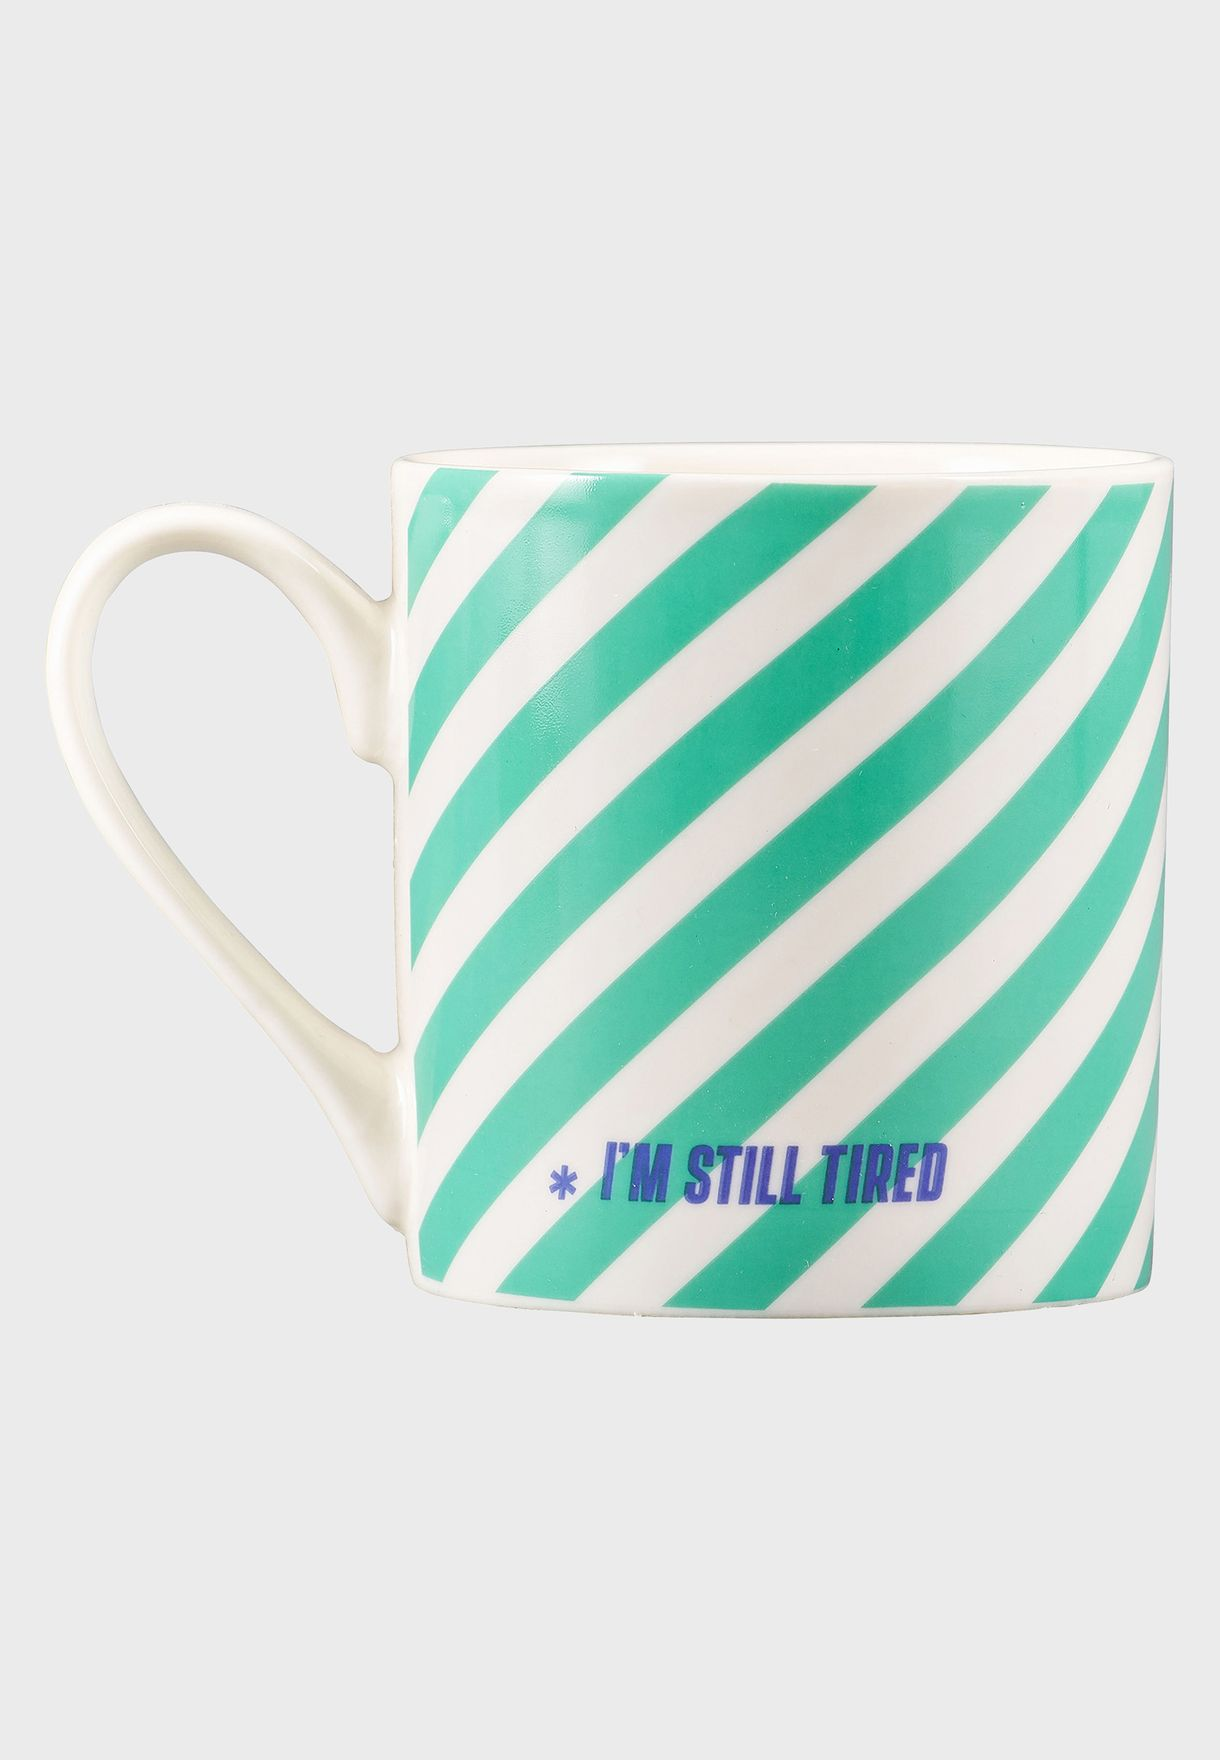 This Coffee Is Broken Striped Mug